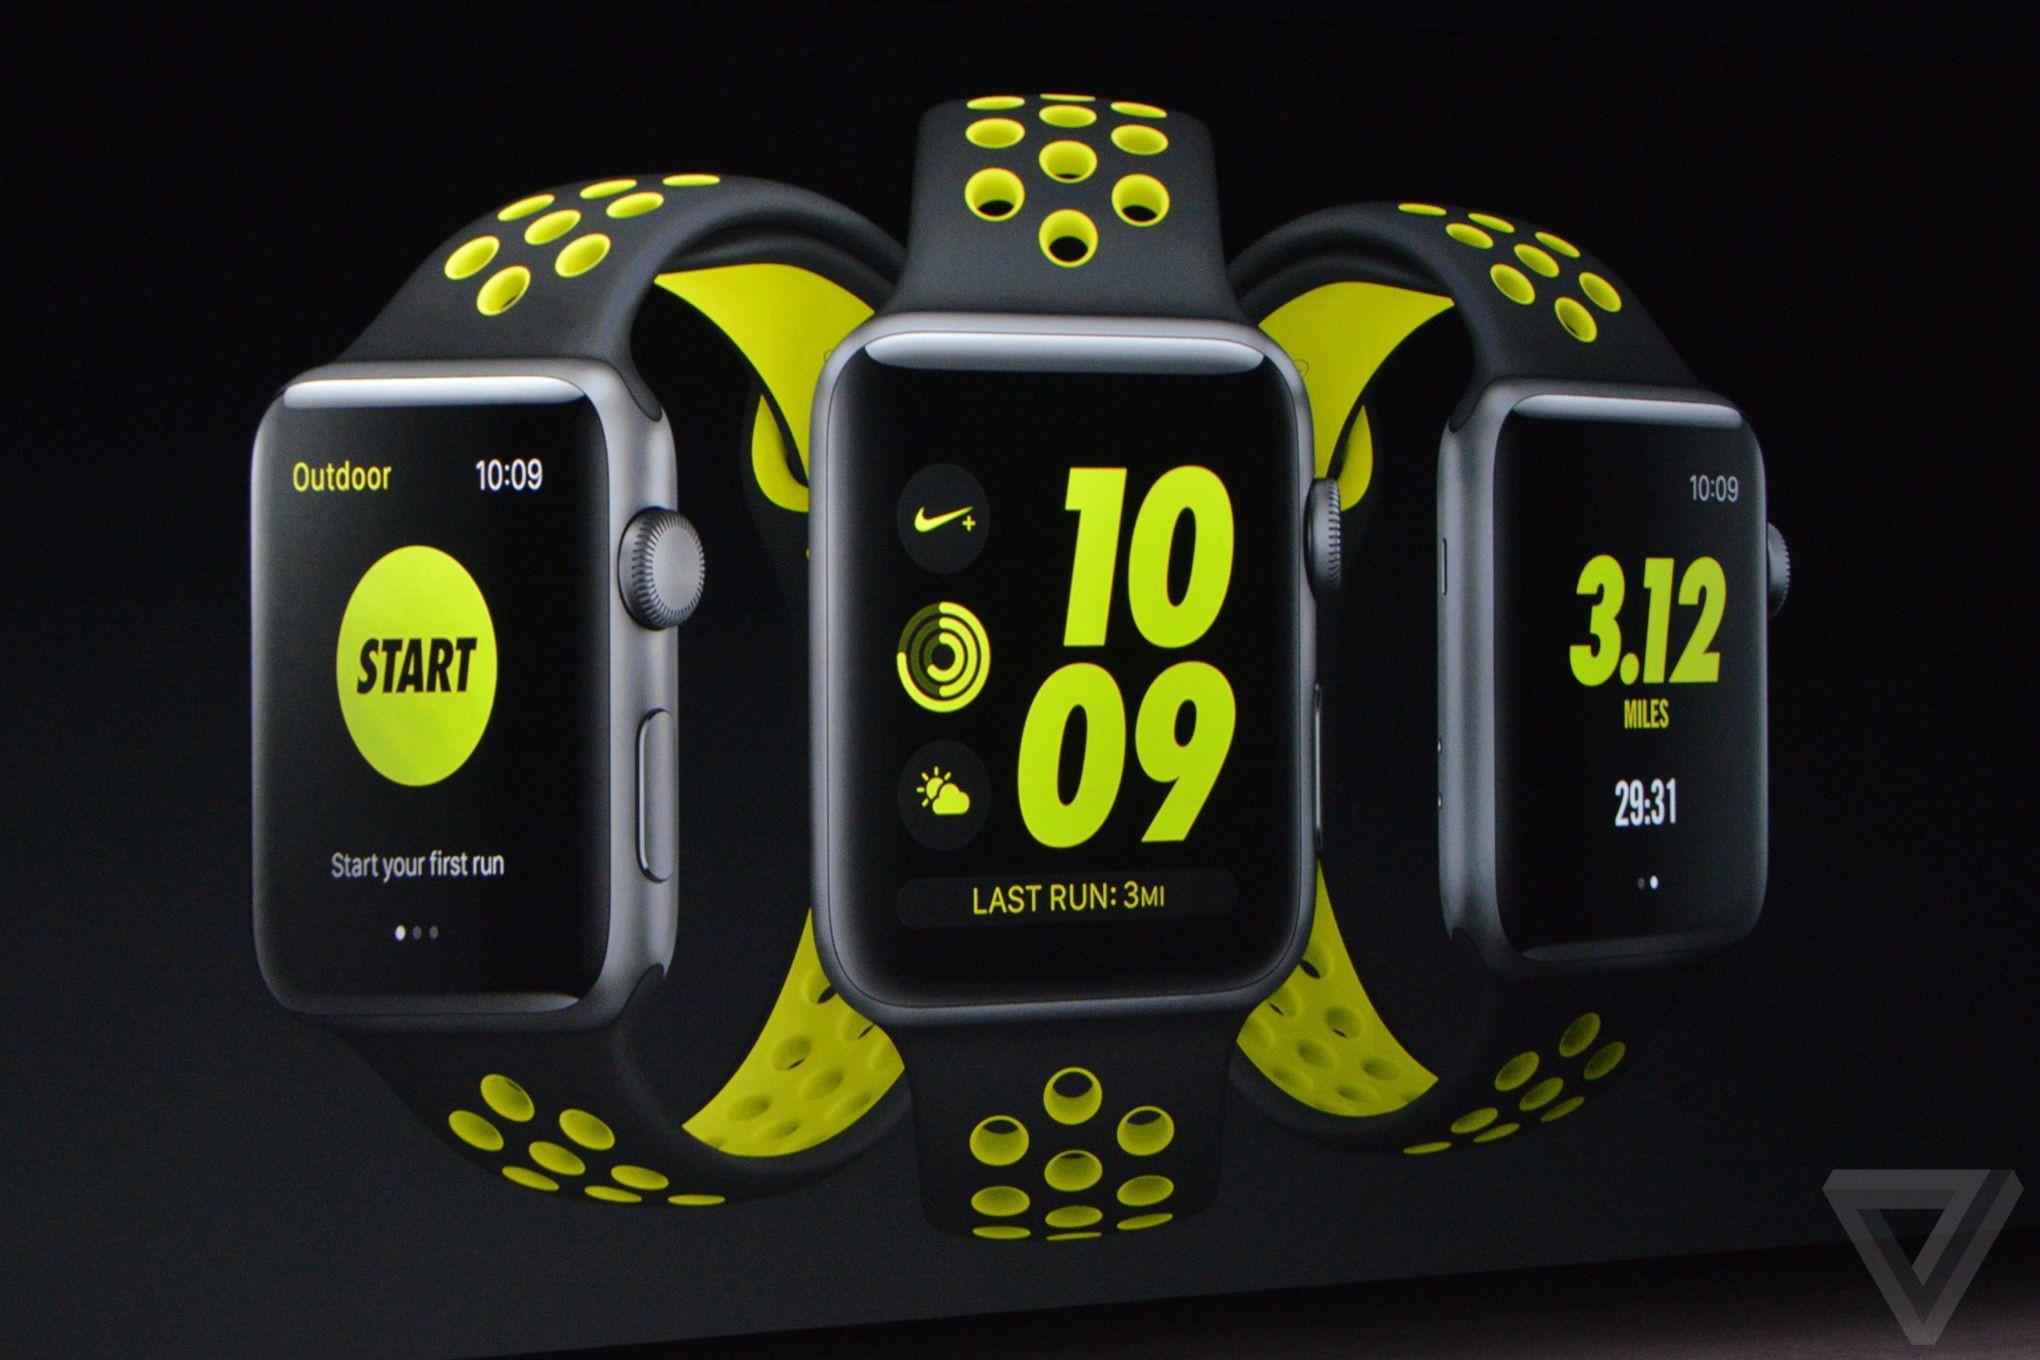 1473270692_apple-iphone-watch-20160907-4400.jpg